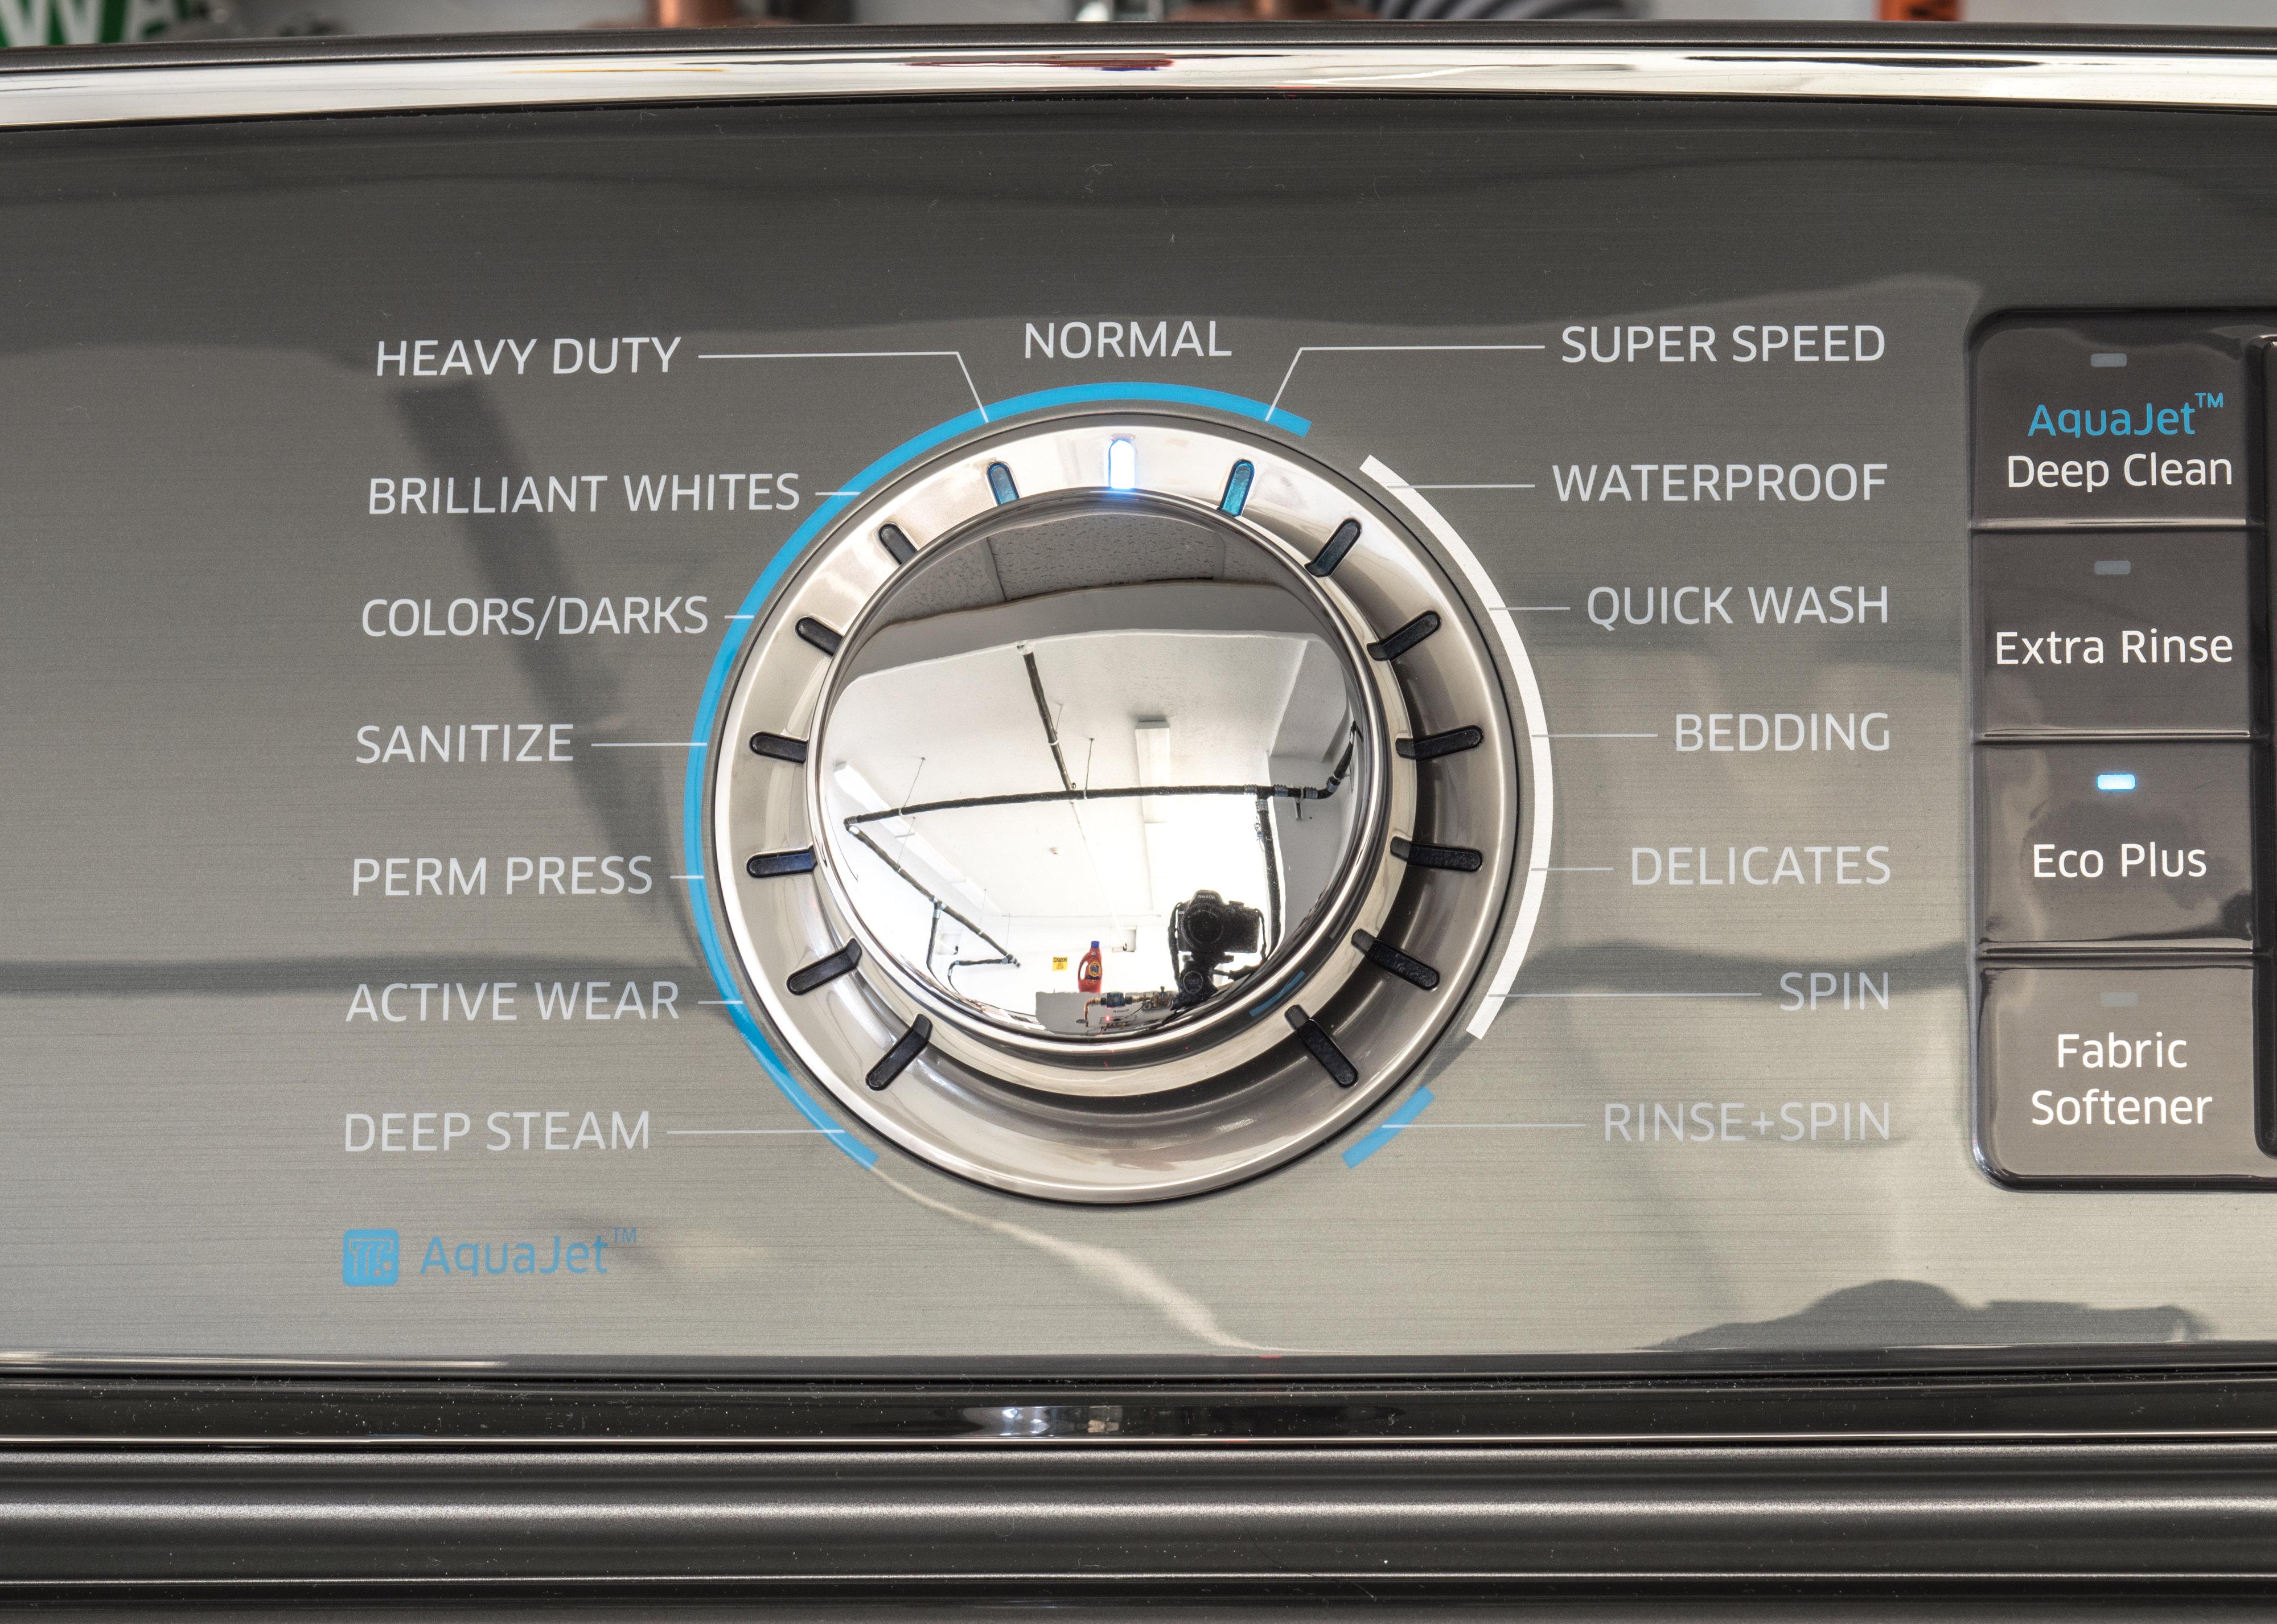 Samsung Wa52j8700ap Activewash Washing Machine Review